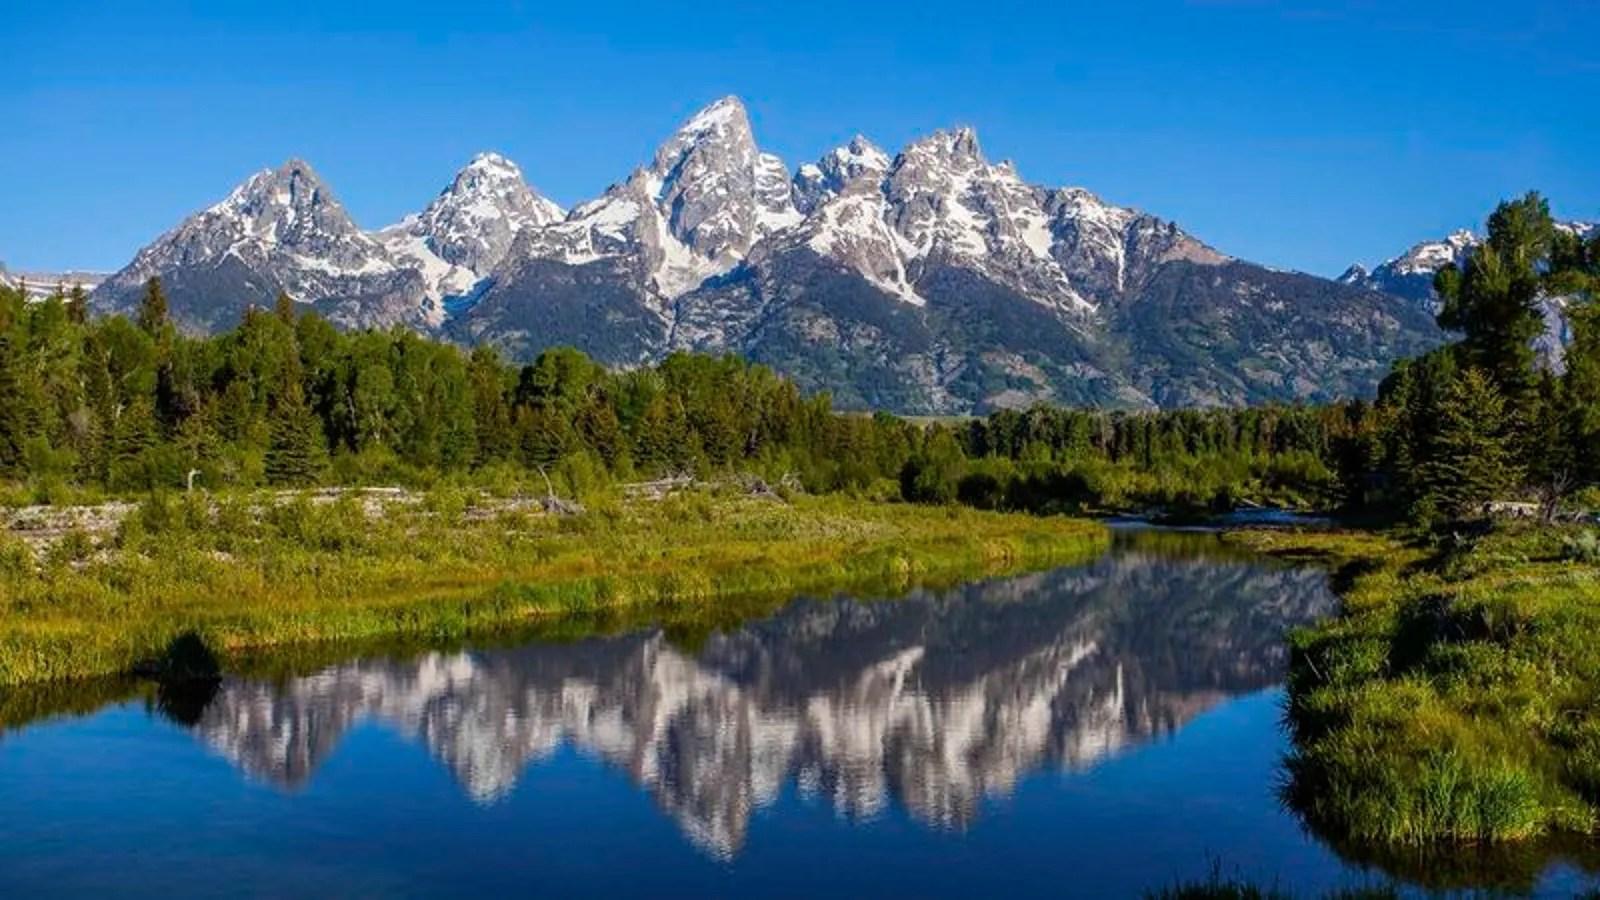 Secretary Of Interior Says Knocking Down Rocky Mountains